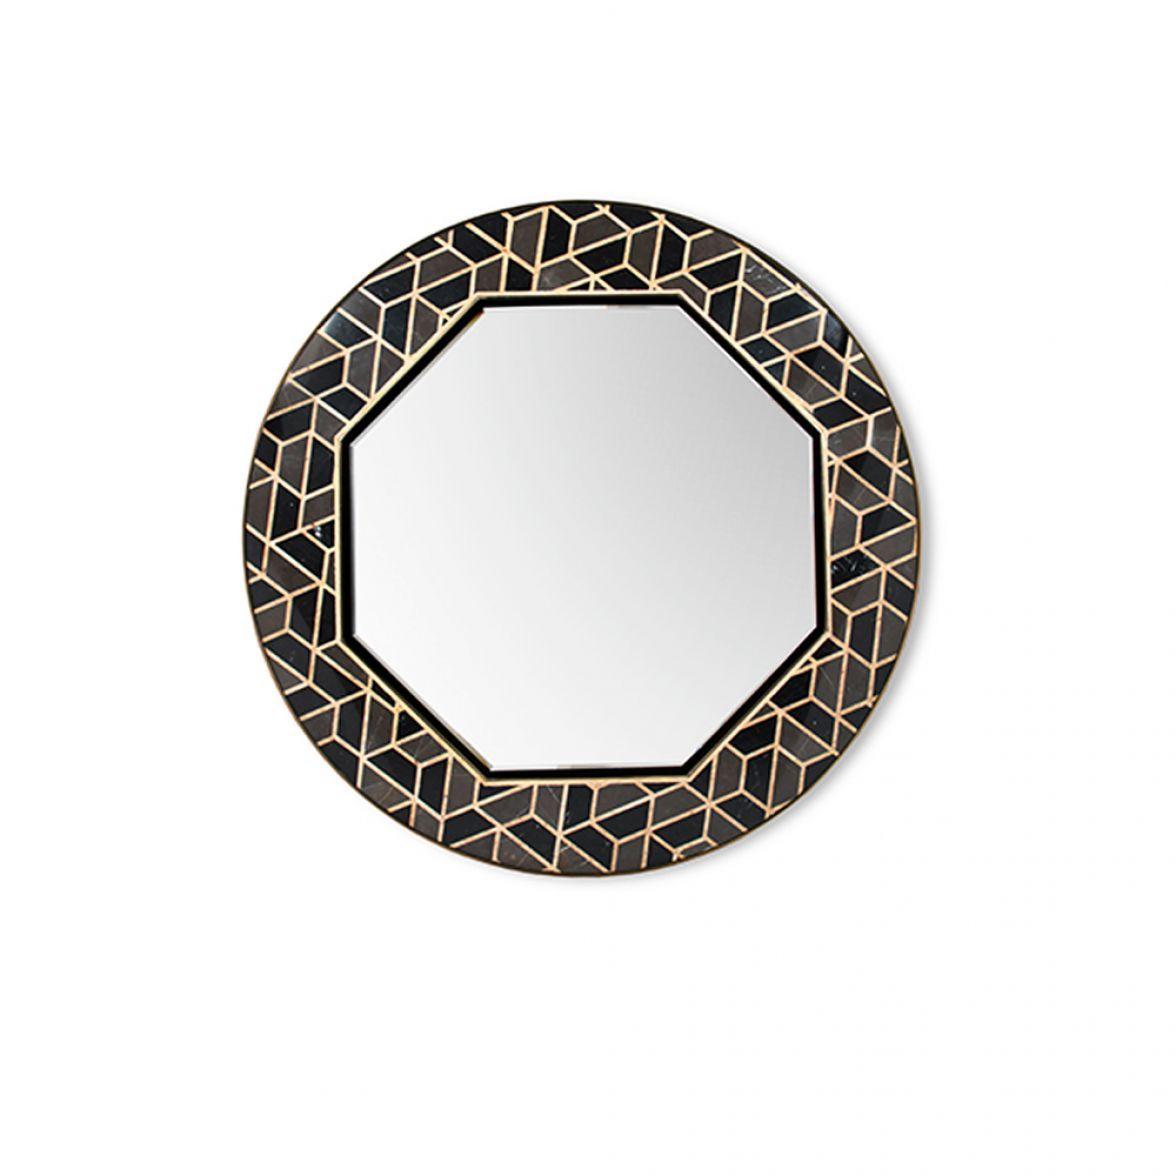 Tortoise mirror